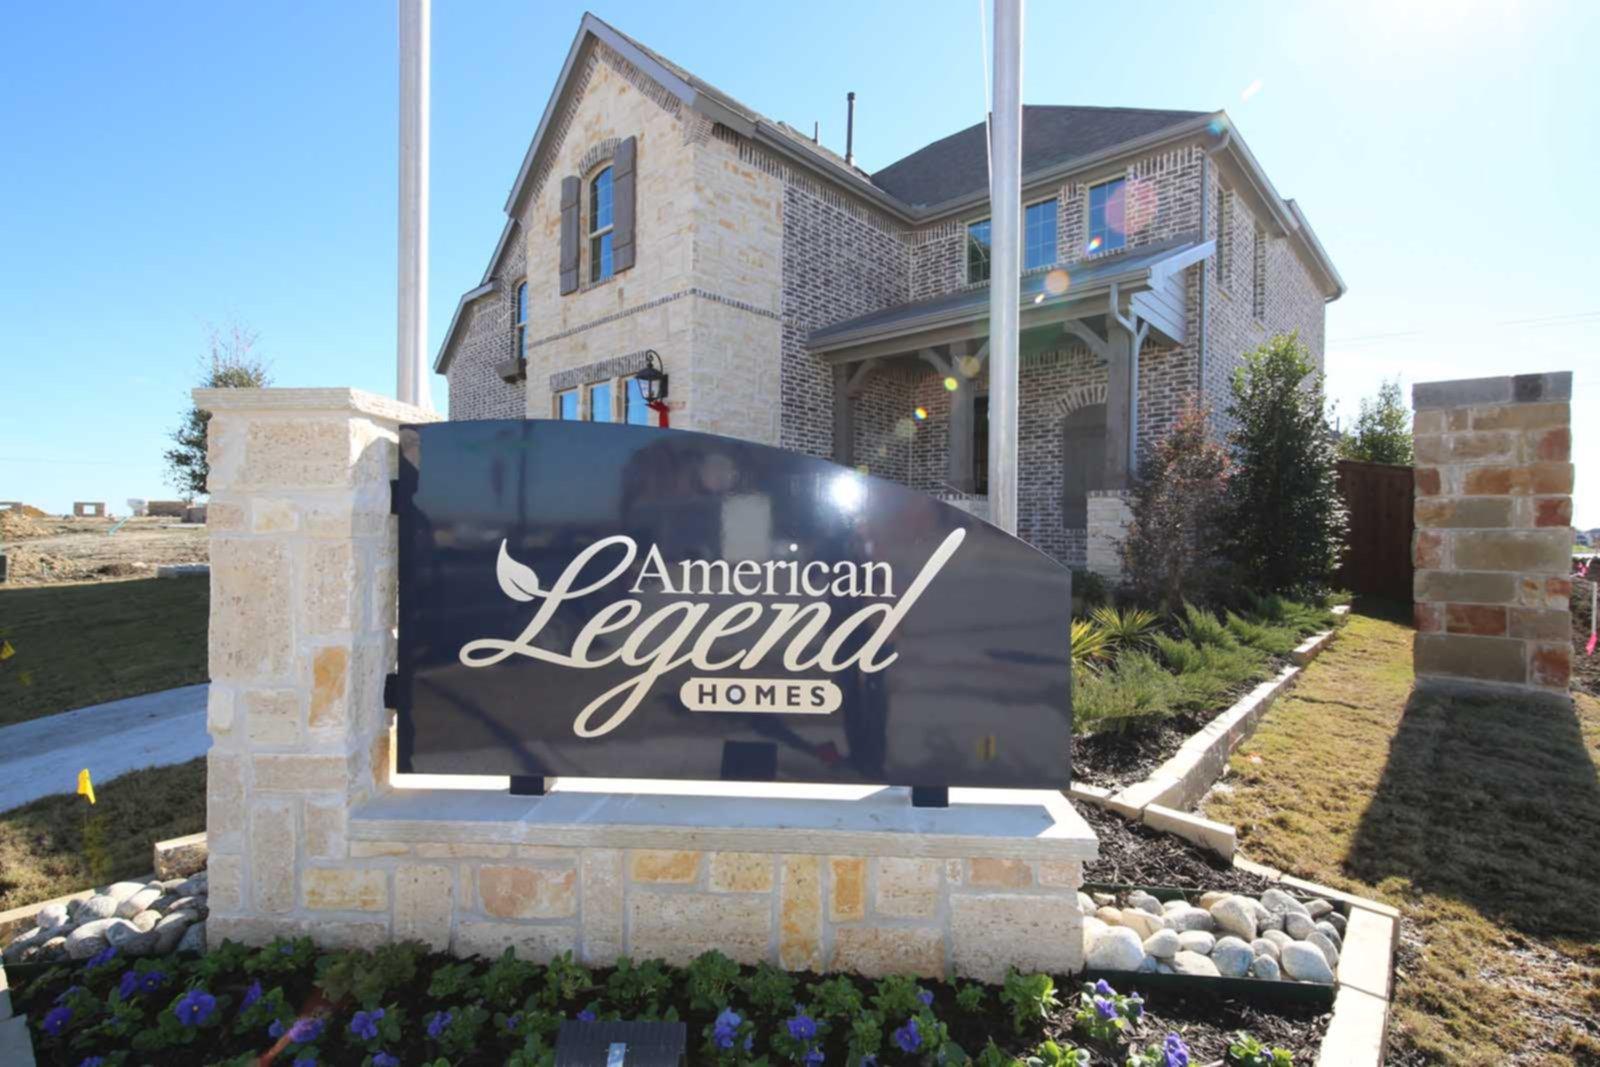 American legend model homes